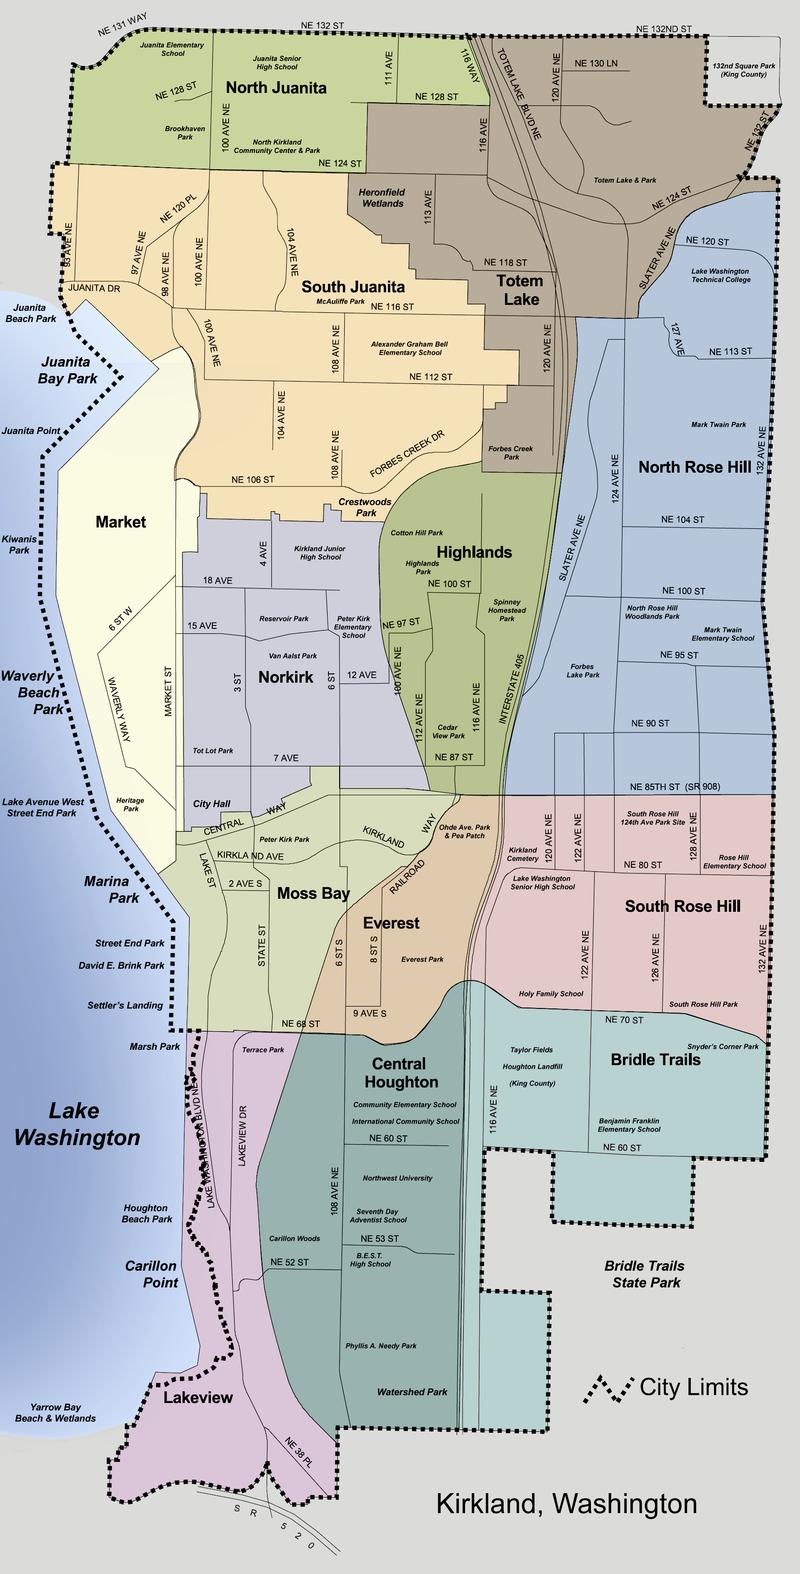 Kirkland, Washington neighborhood map.png